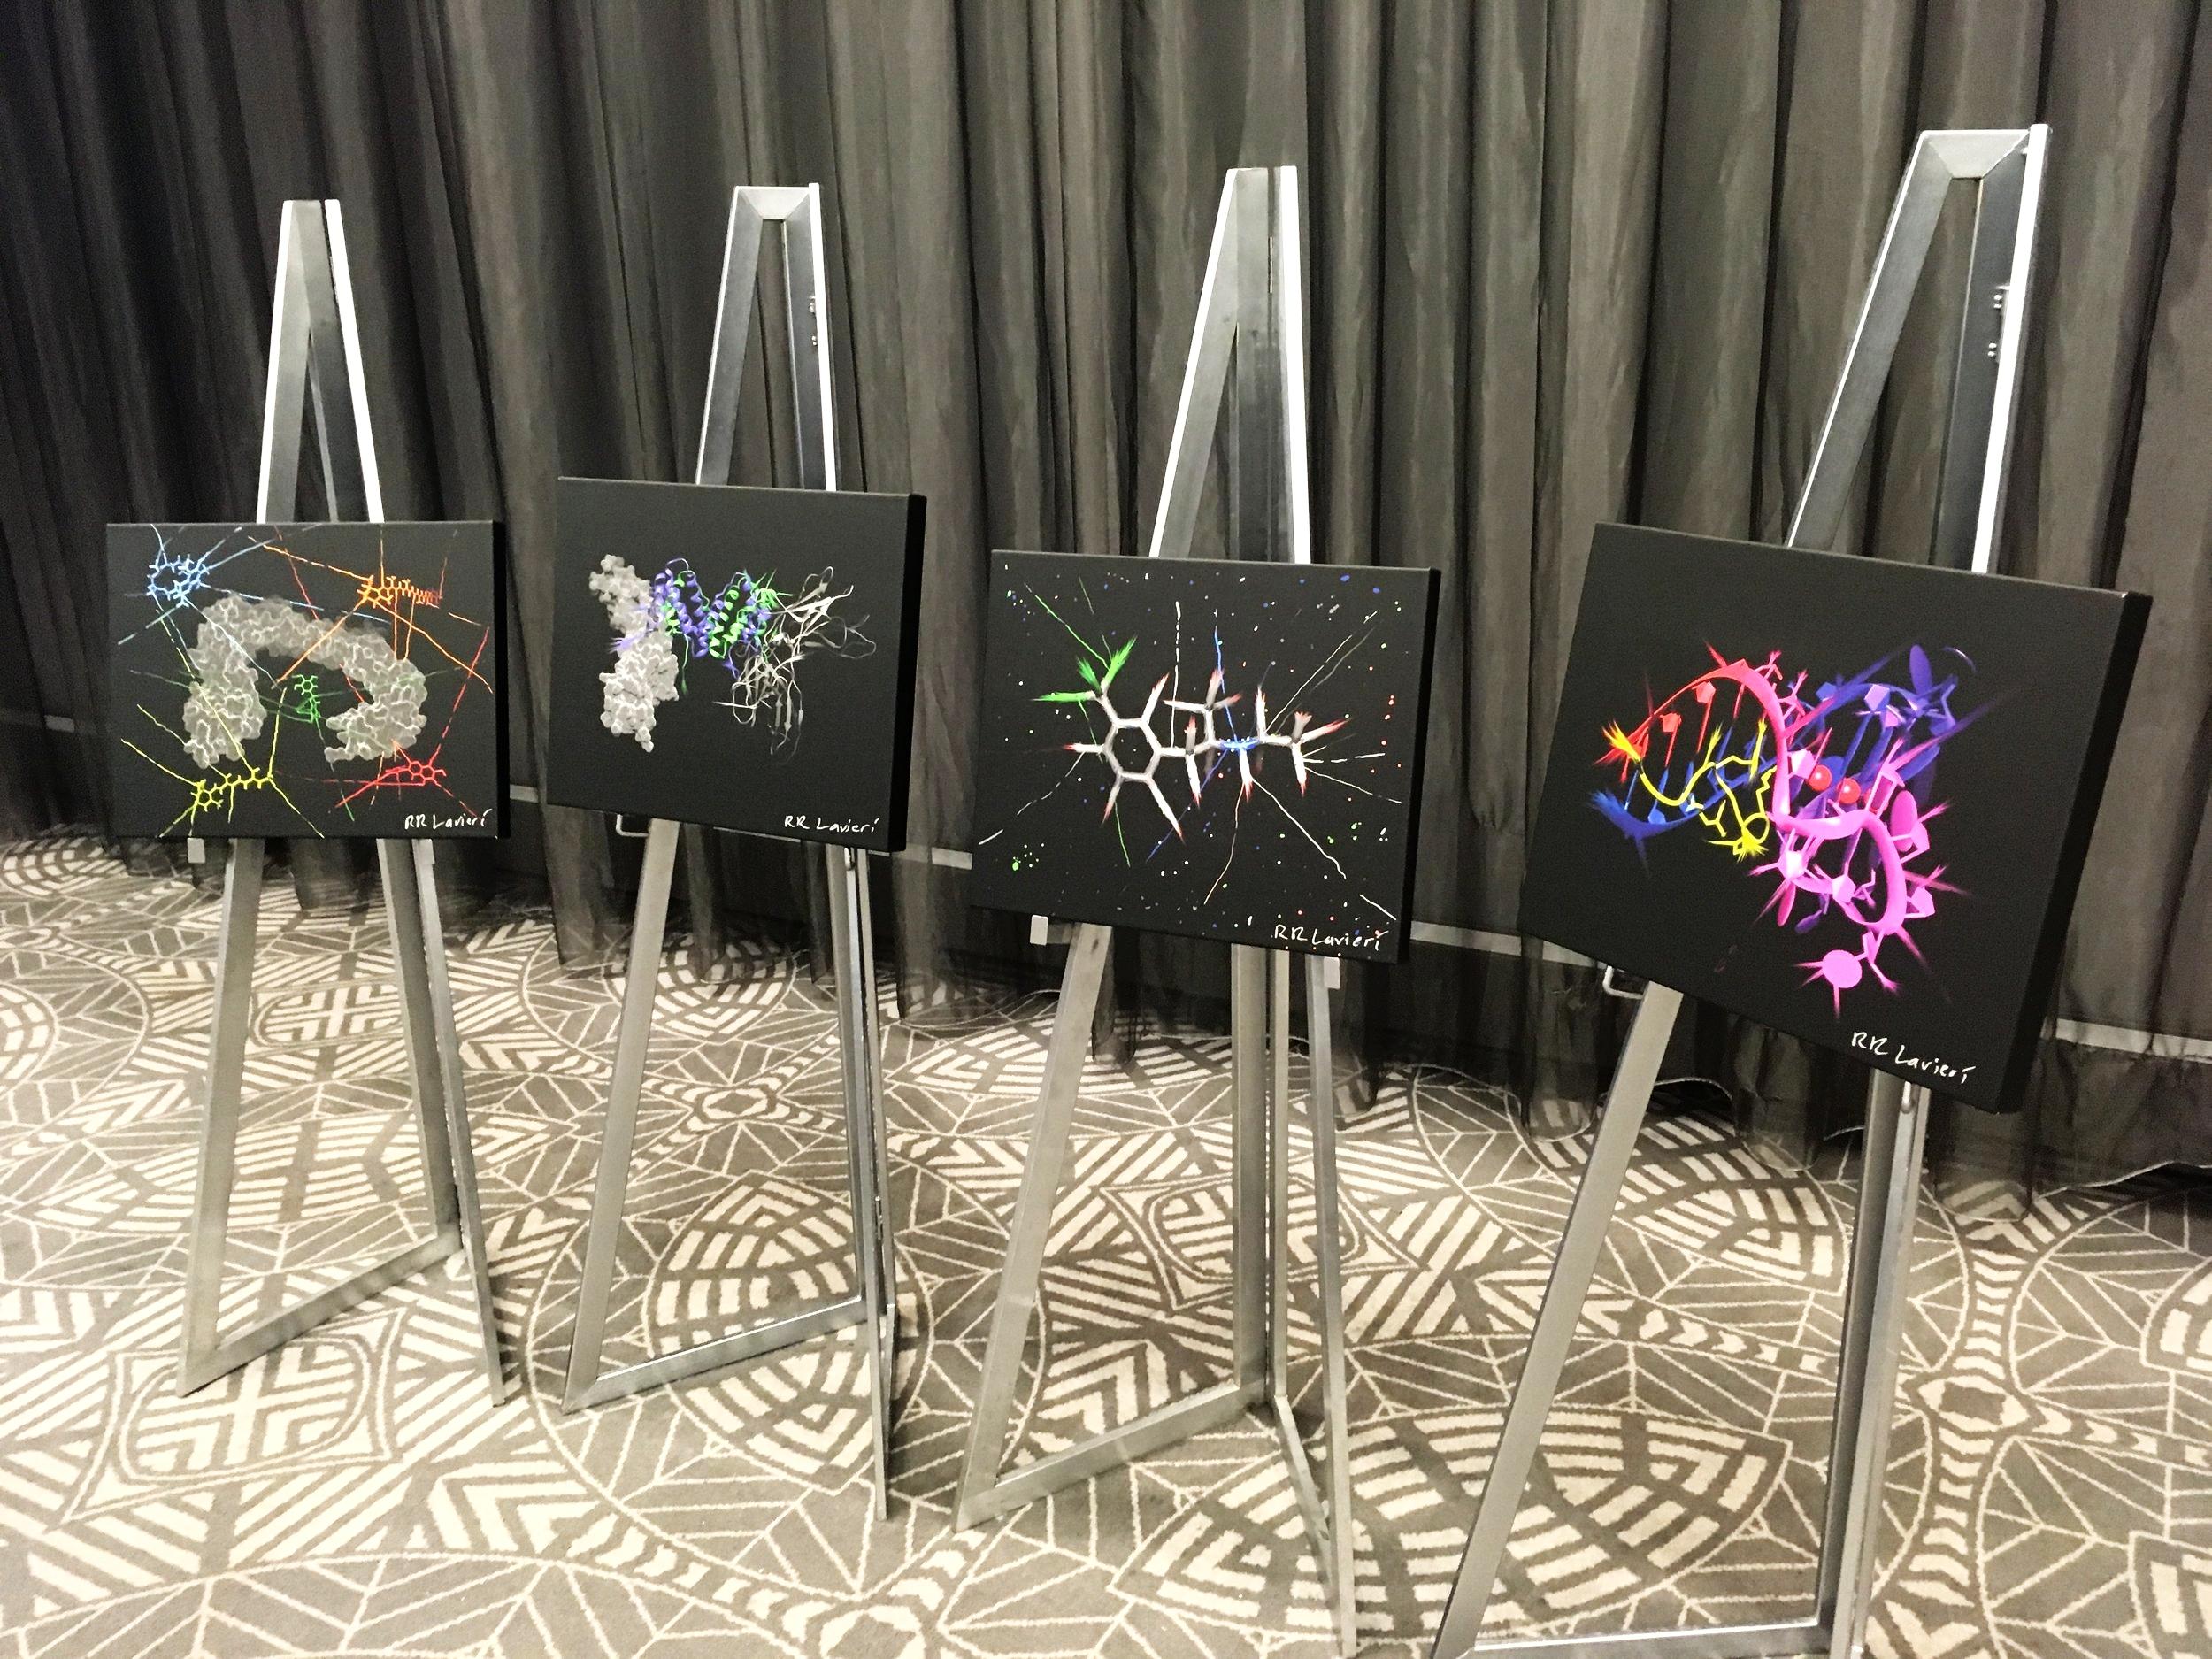 Cures Within Reach 2017 Global Health Repurposing Awards Event , 2017, the radisson blu aqua, Chicago, il